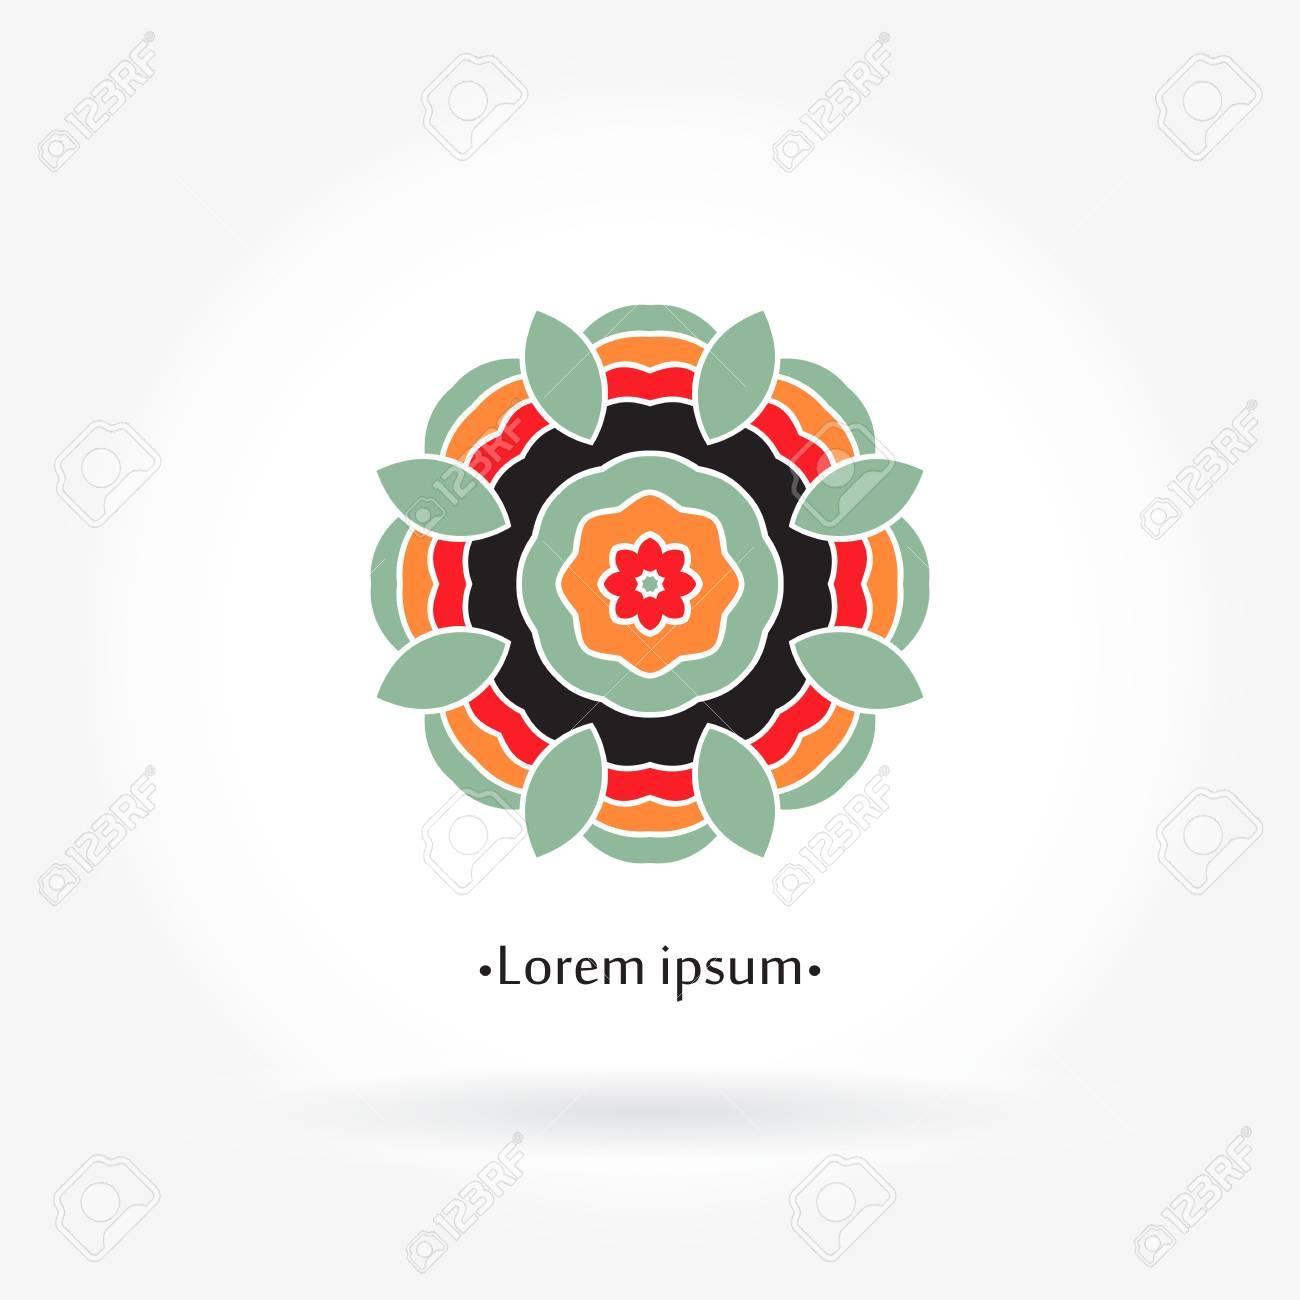 Hermoso Logo Circular Logotipo Geometrico Simple Logotipo De La